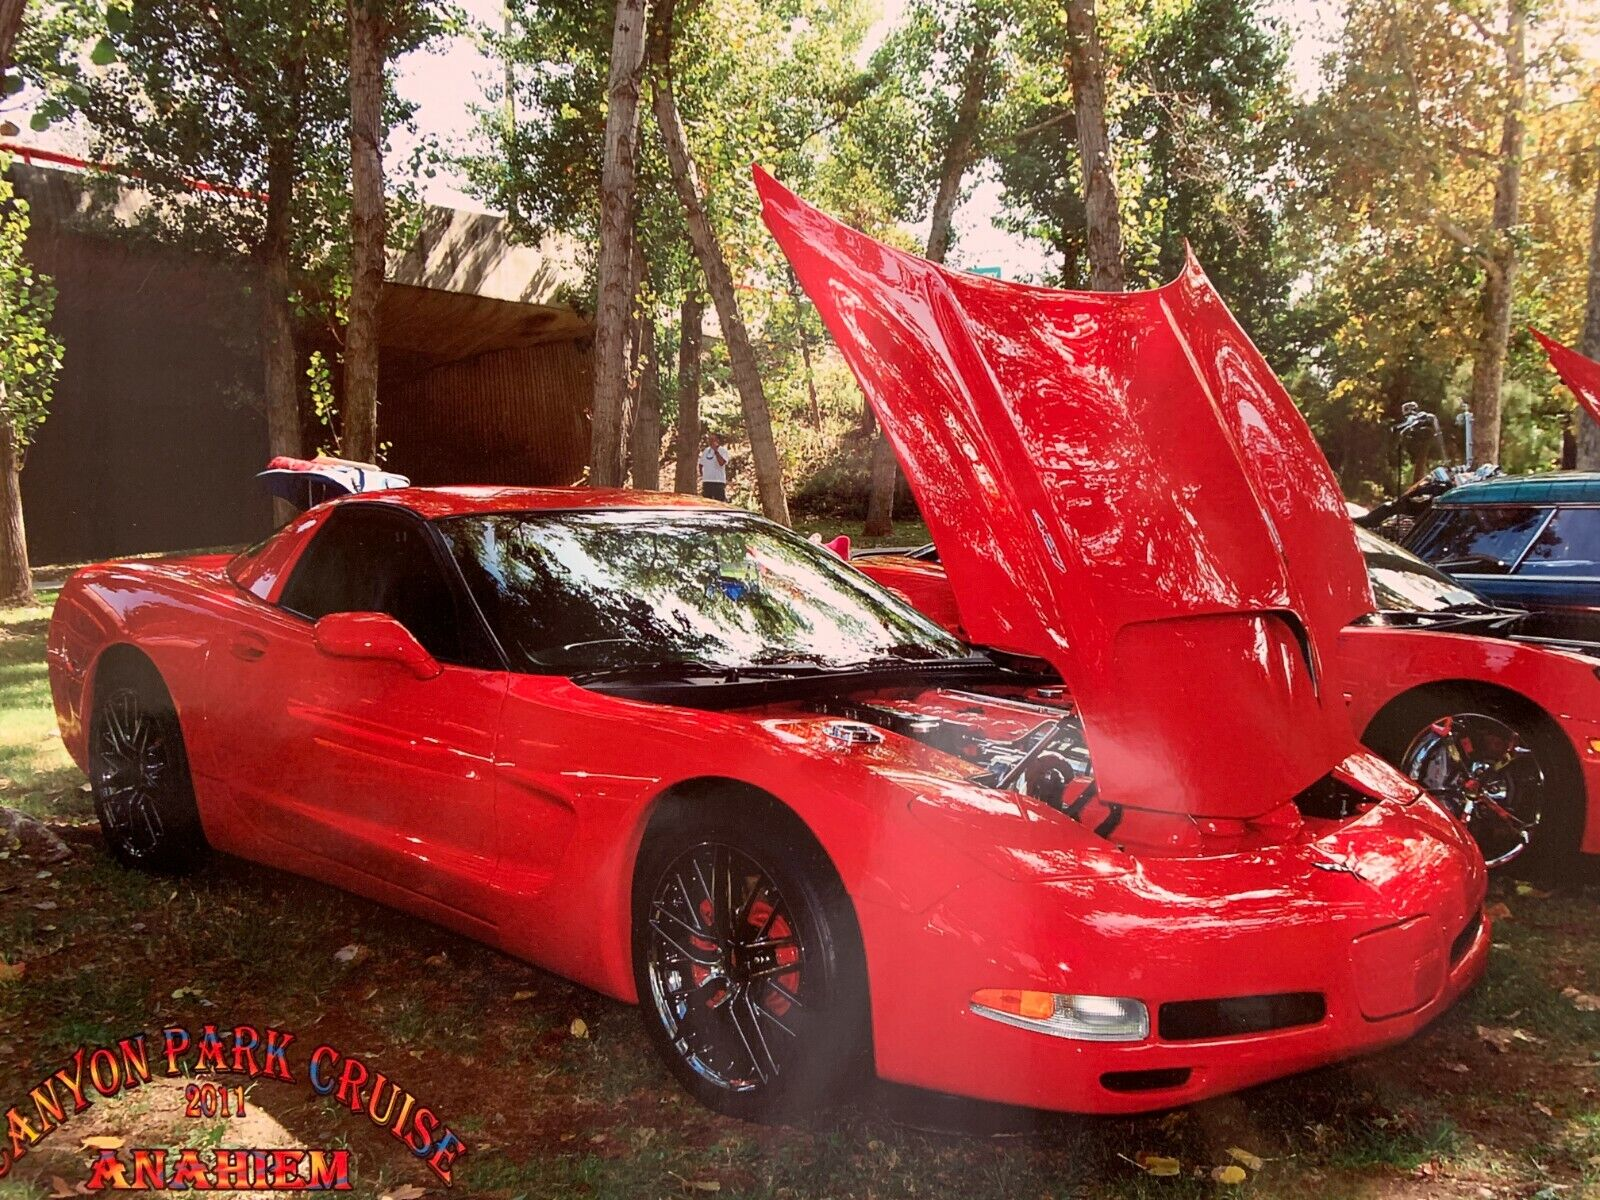 2001 Red Chevrolet Corvette   | C5 Corvette Photo 1